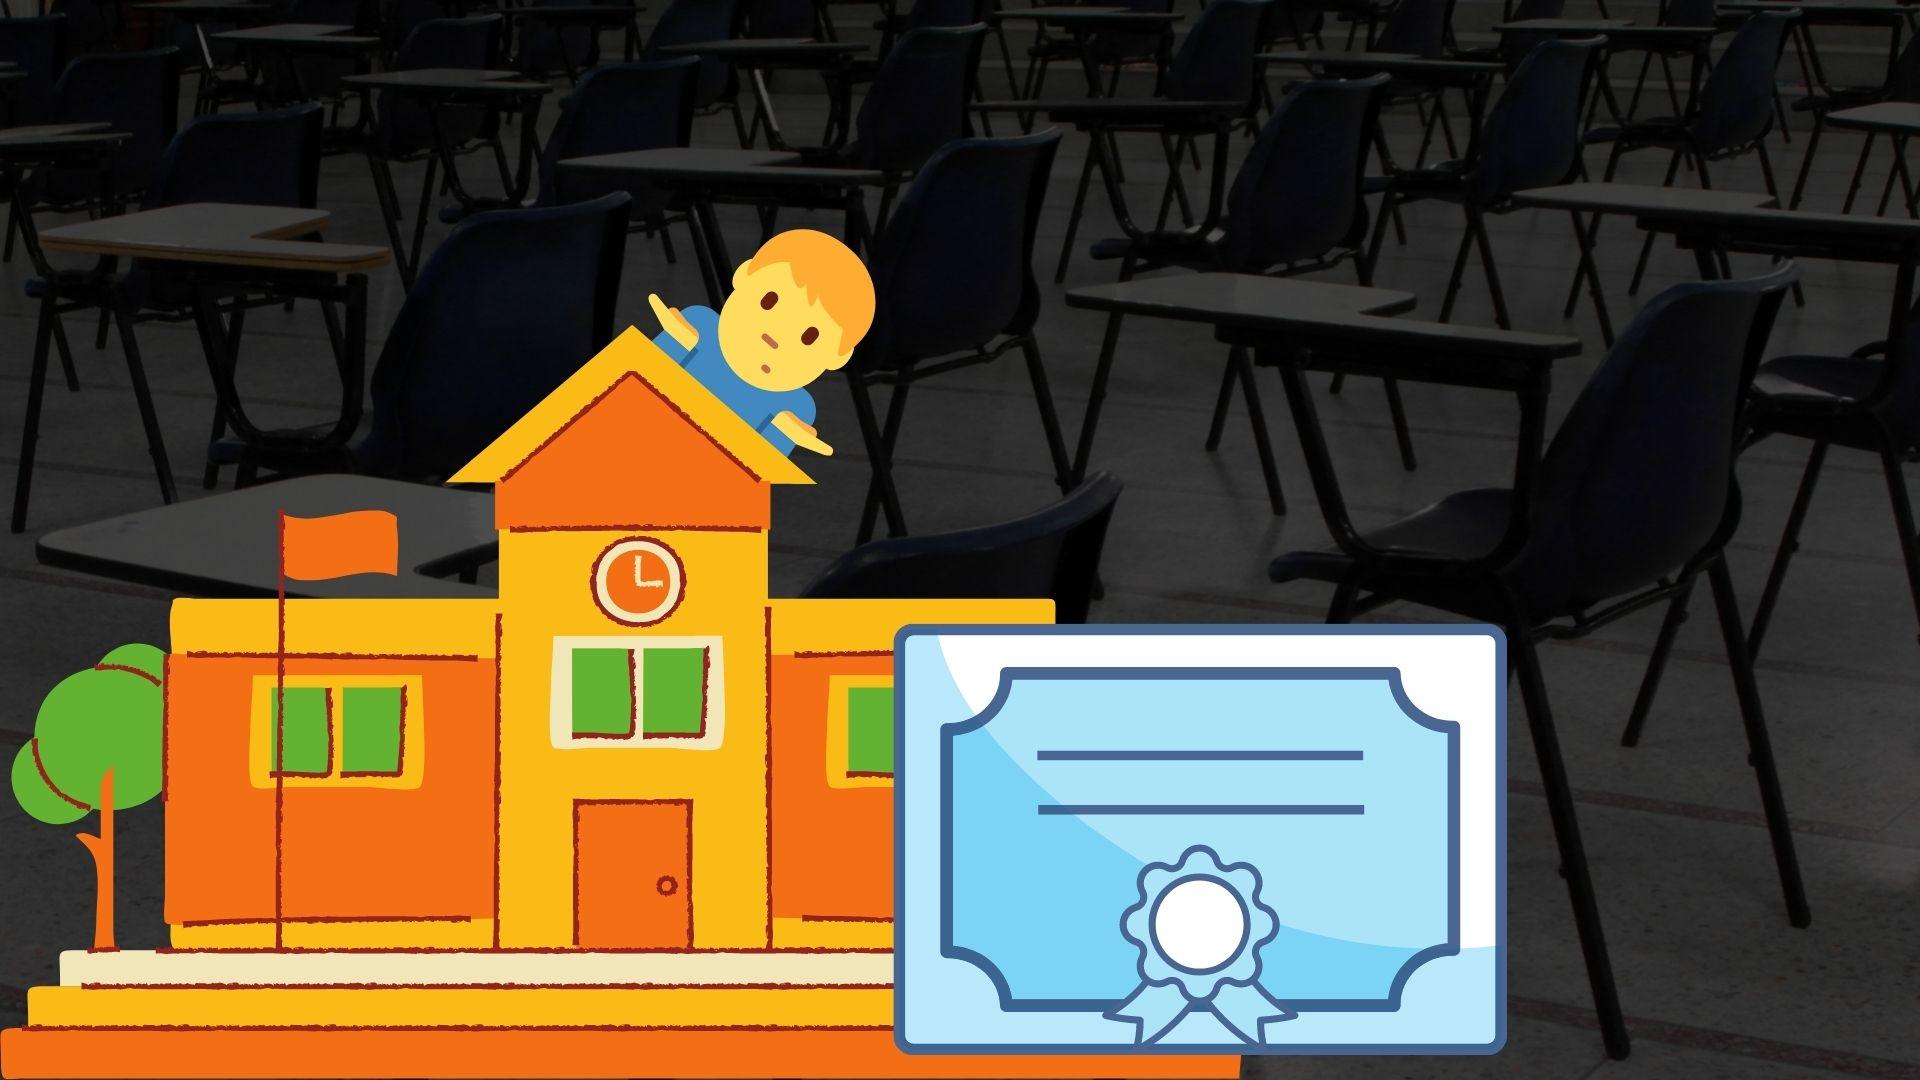 examination hall school degree